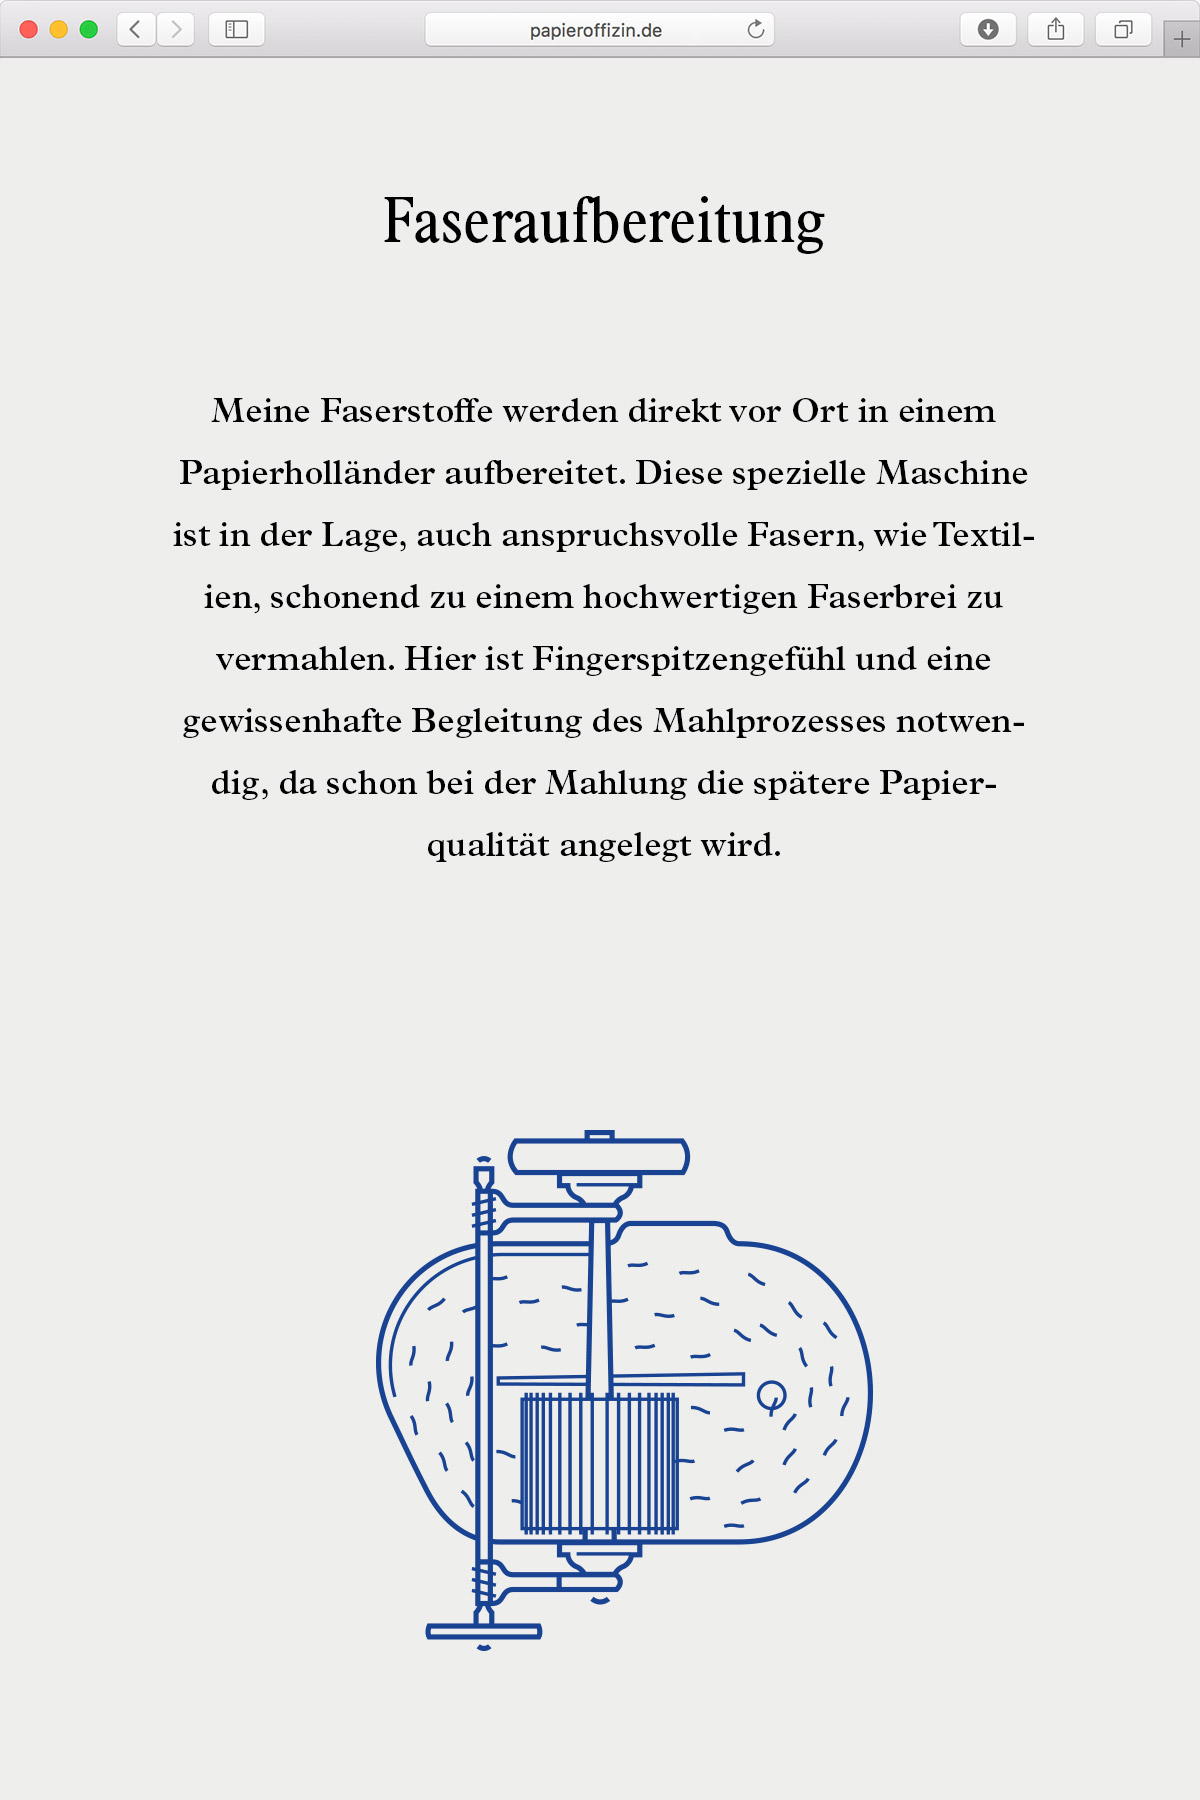 Papieroffizin Matthias Schwethelm – Logo-Relaunch, Corporate Design, Information Graphics von ELLIJOT